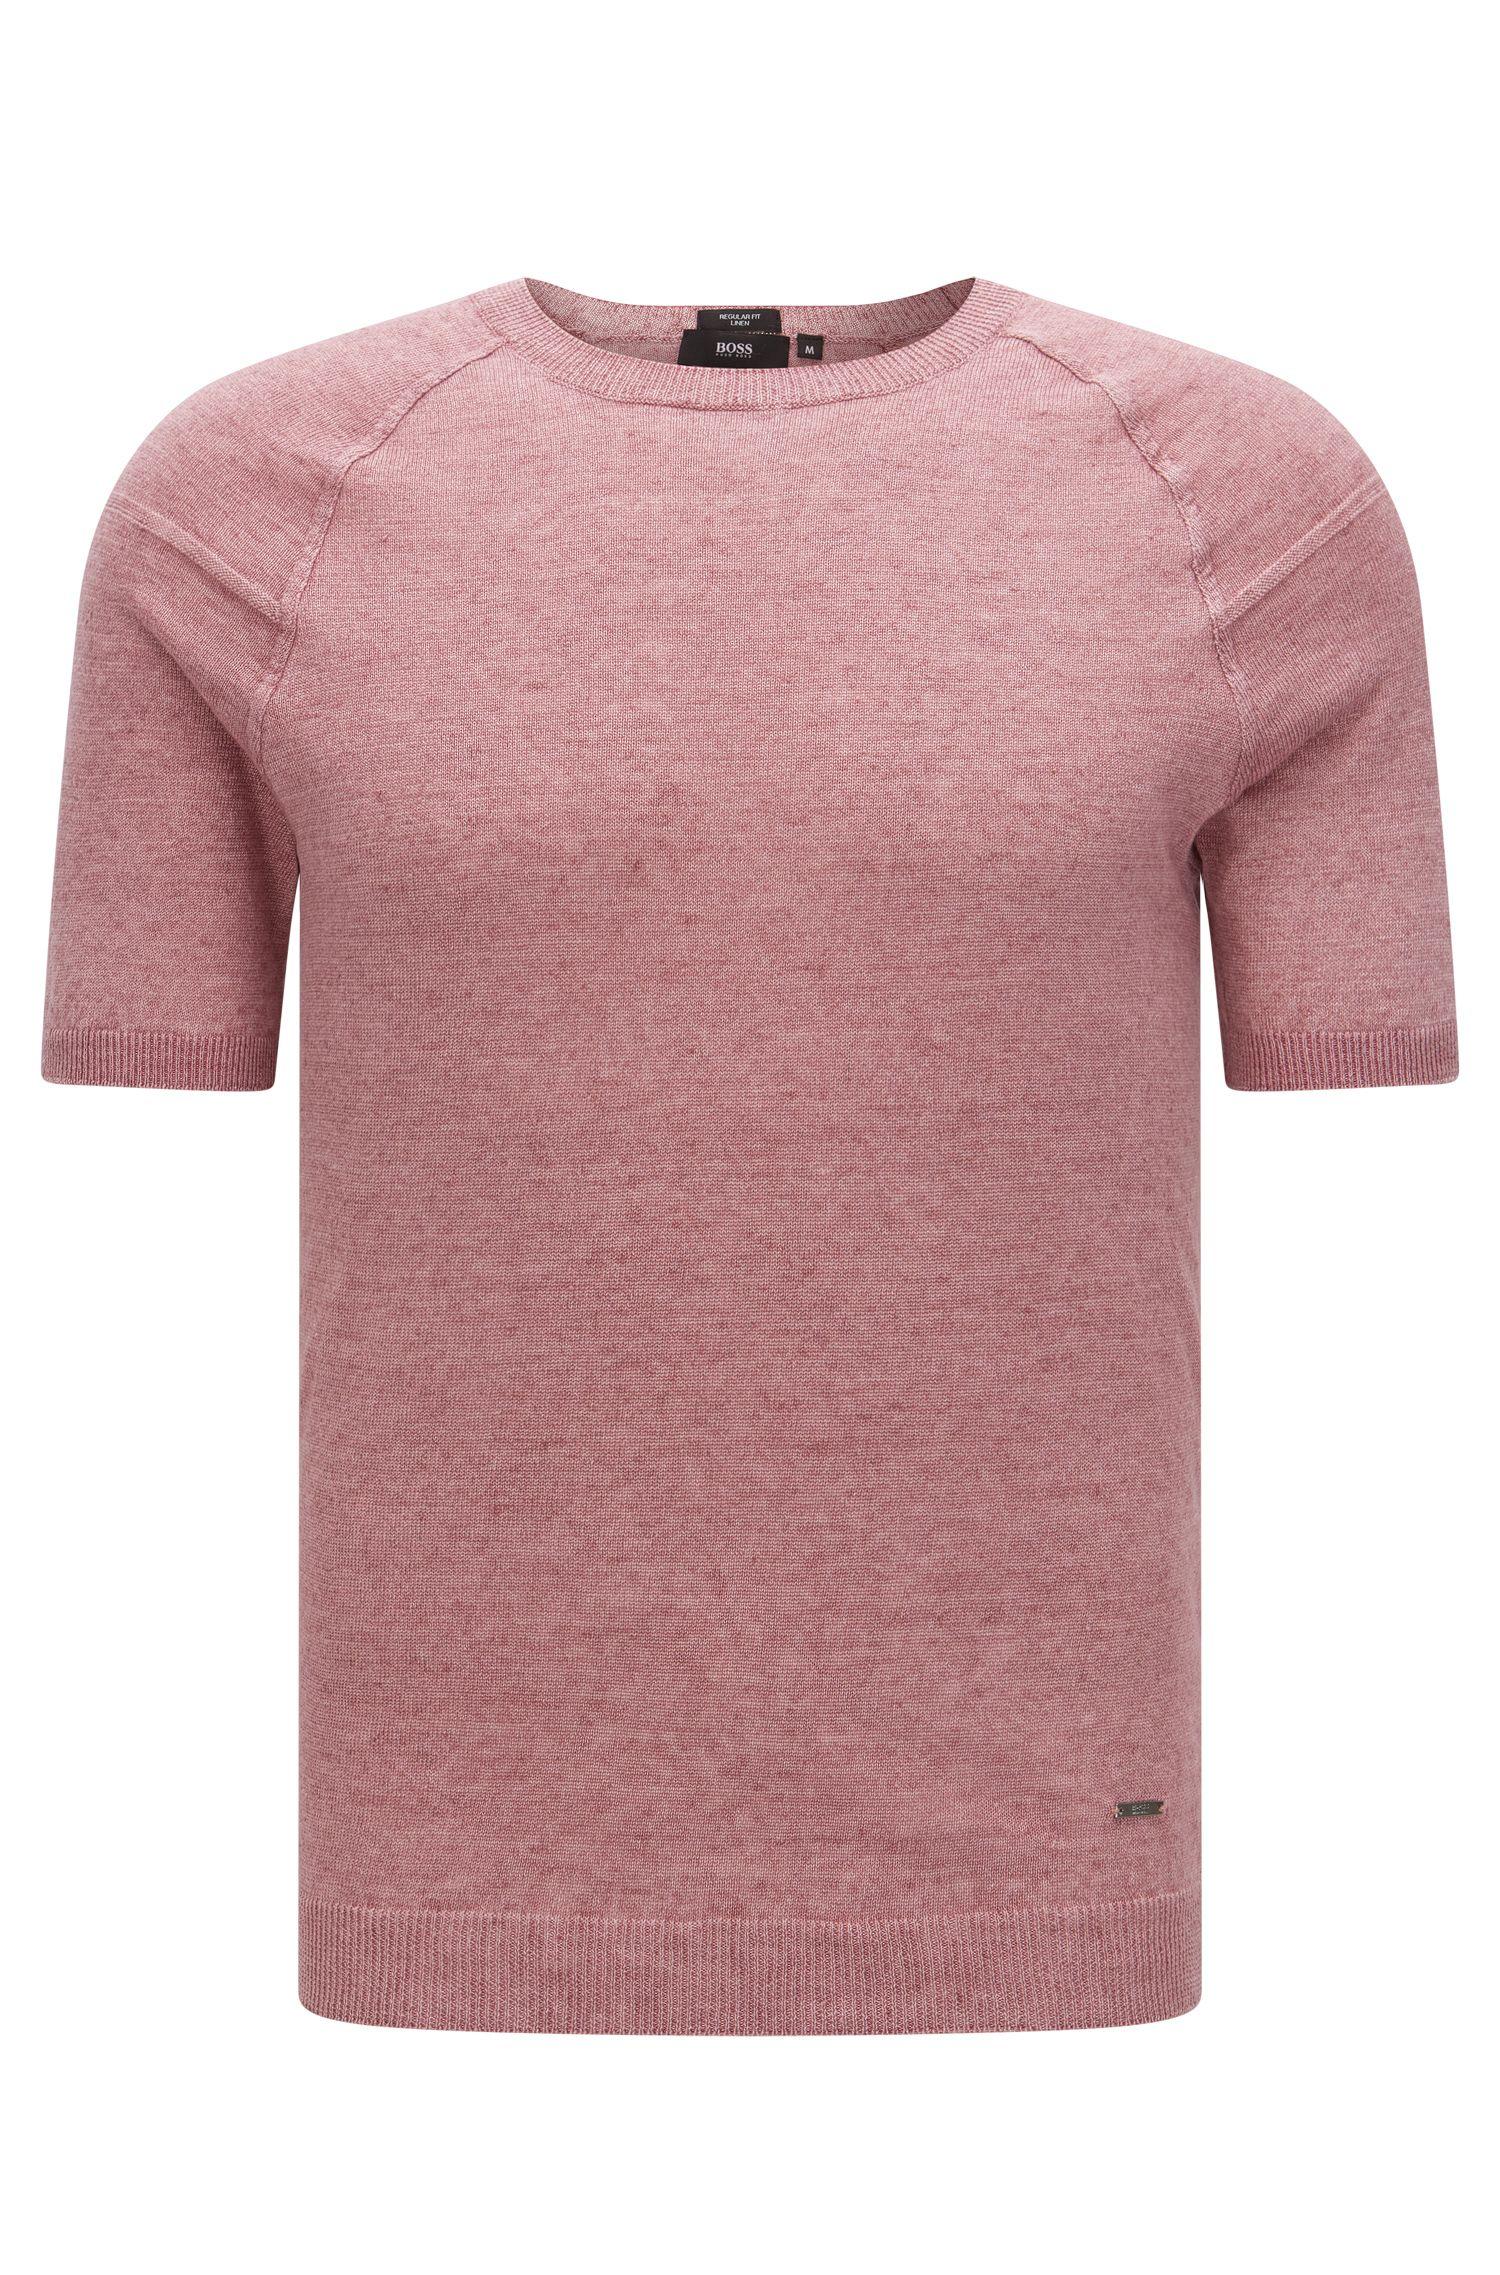 'Olvin'   Délavé  Linen Raglan T-Shirt